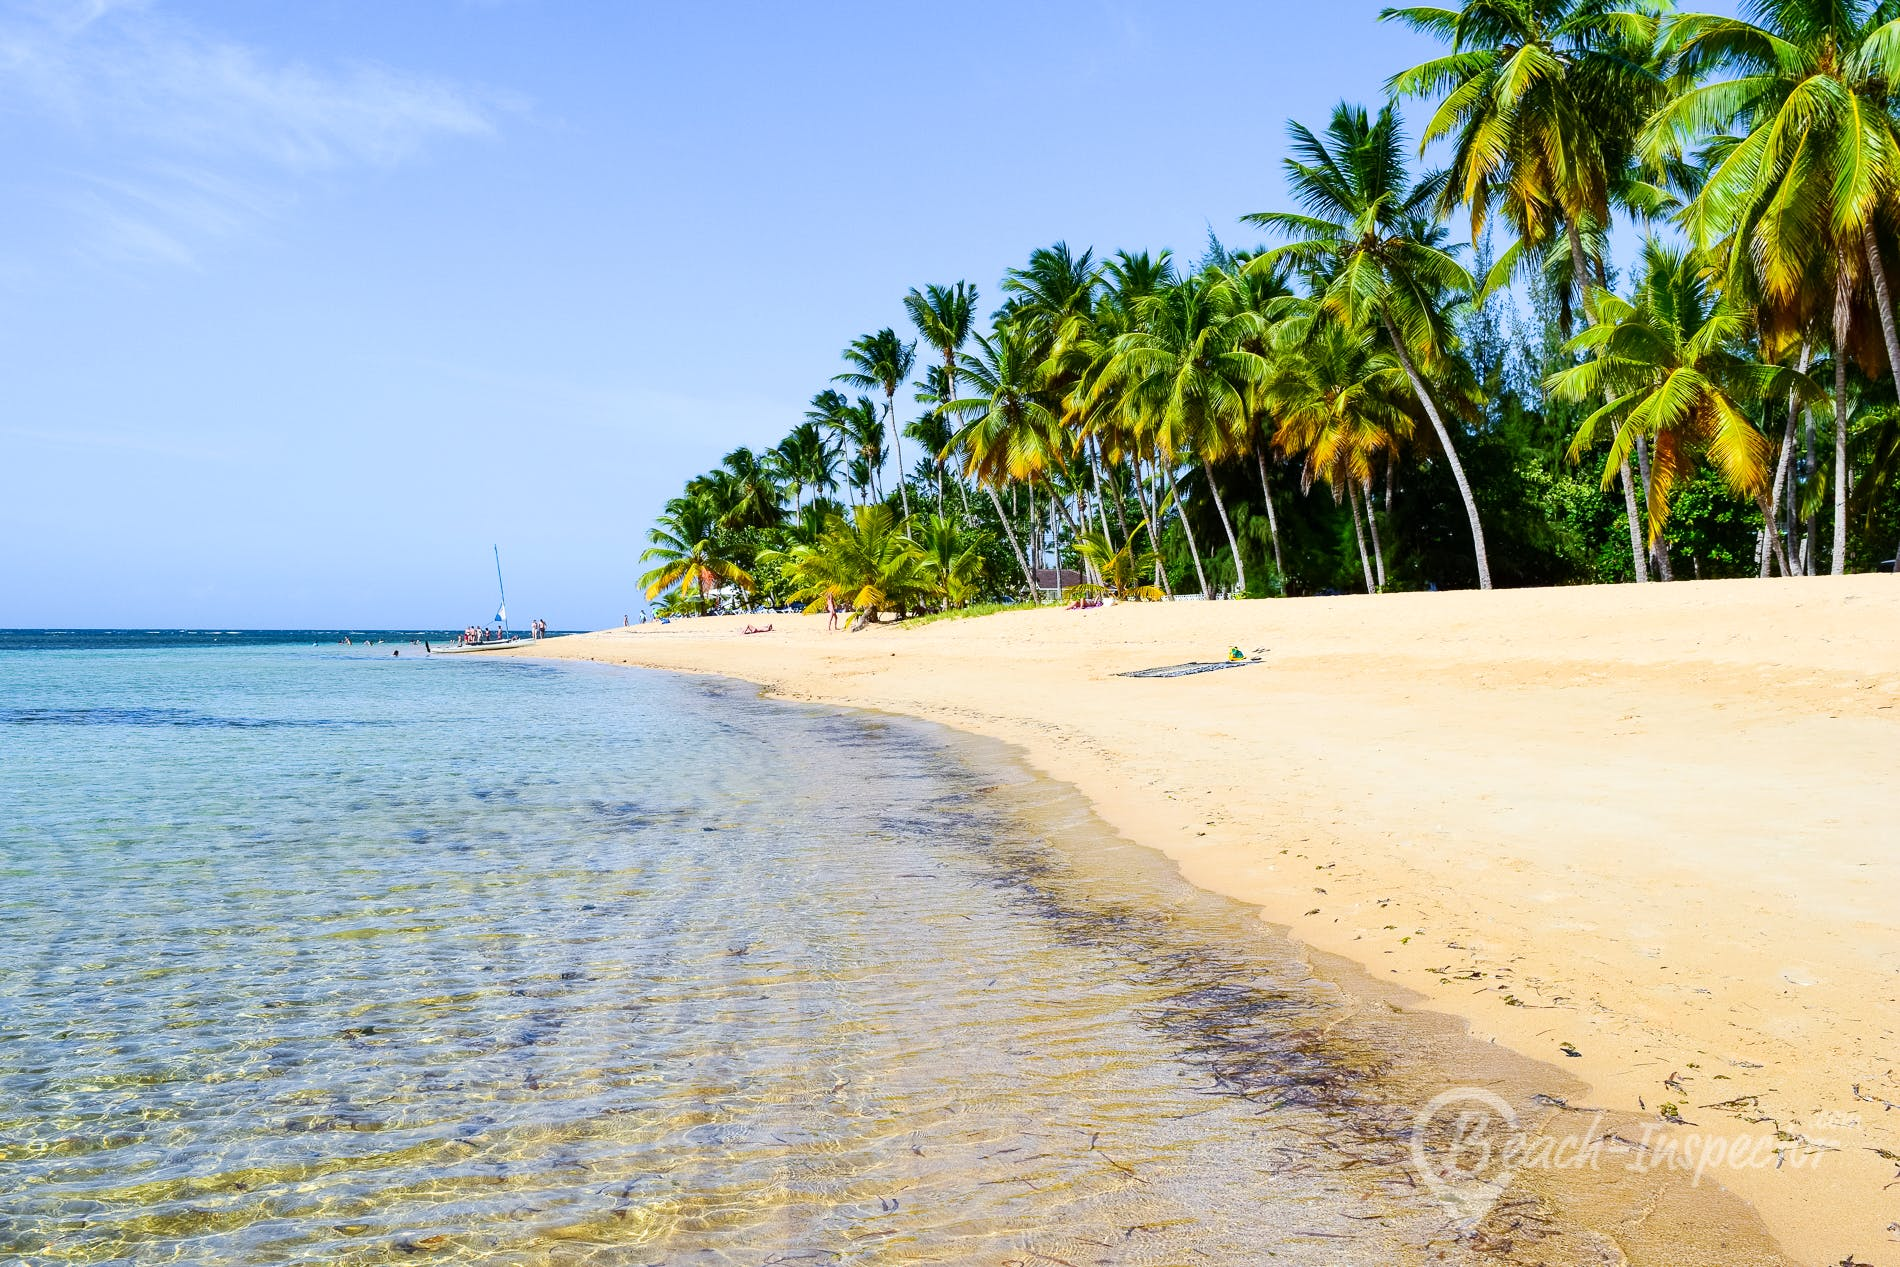 Strand Playa Las Ballenas, Dominikanische Republik, Dominikanische Republik